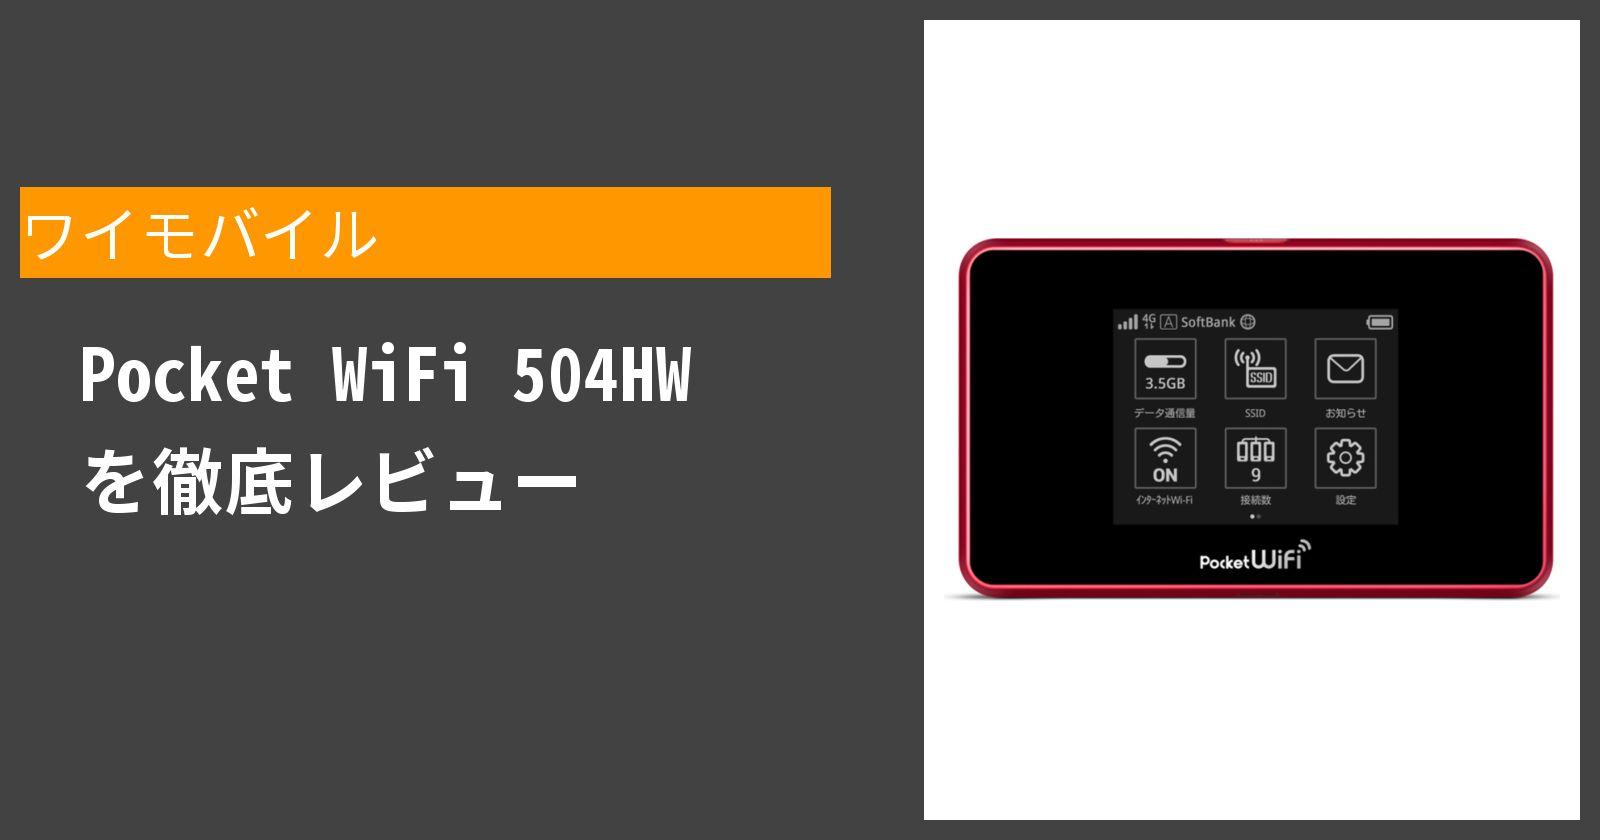 Pocket WiFi 504HWを徹底評価